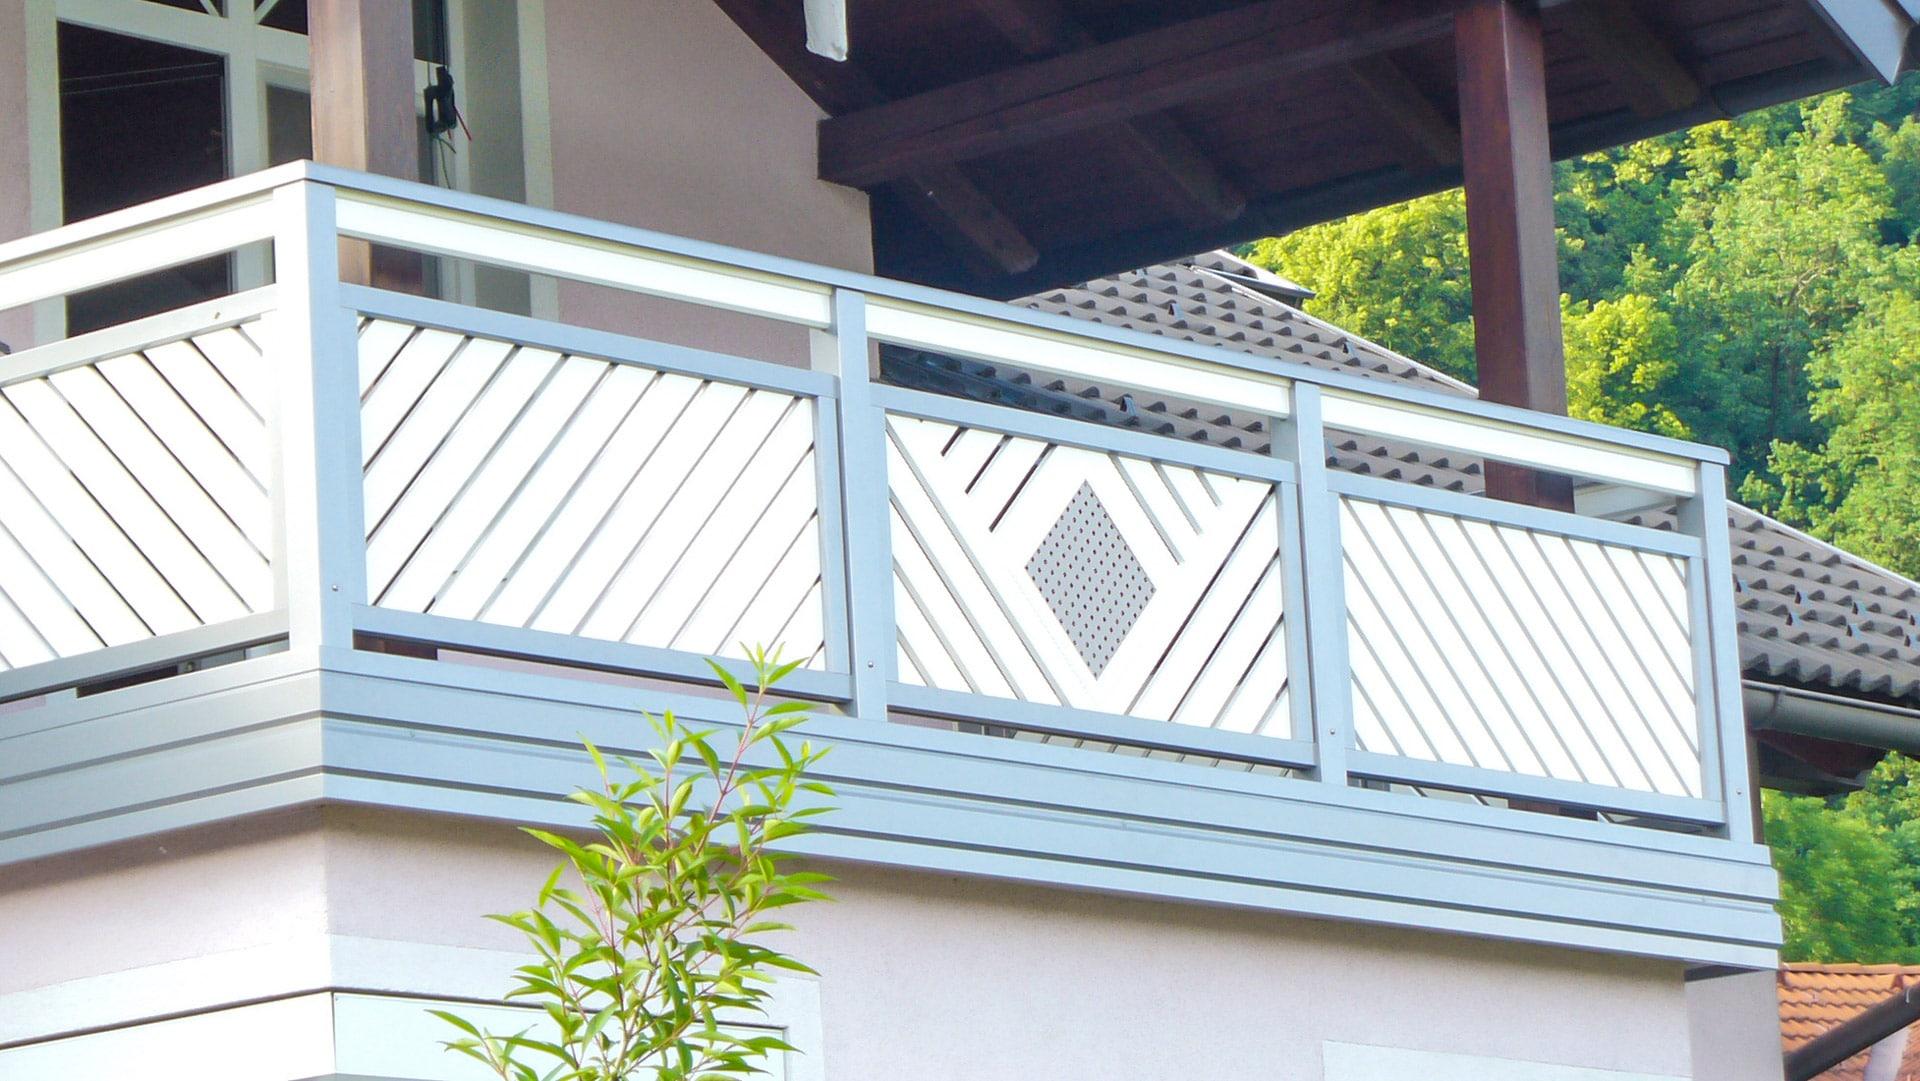 Klagenfurt 01 a   grau weißes Aluminiumgeländer, diagonale Latten, quadratisches Lochblech   Svoboda